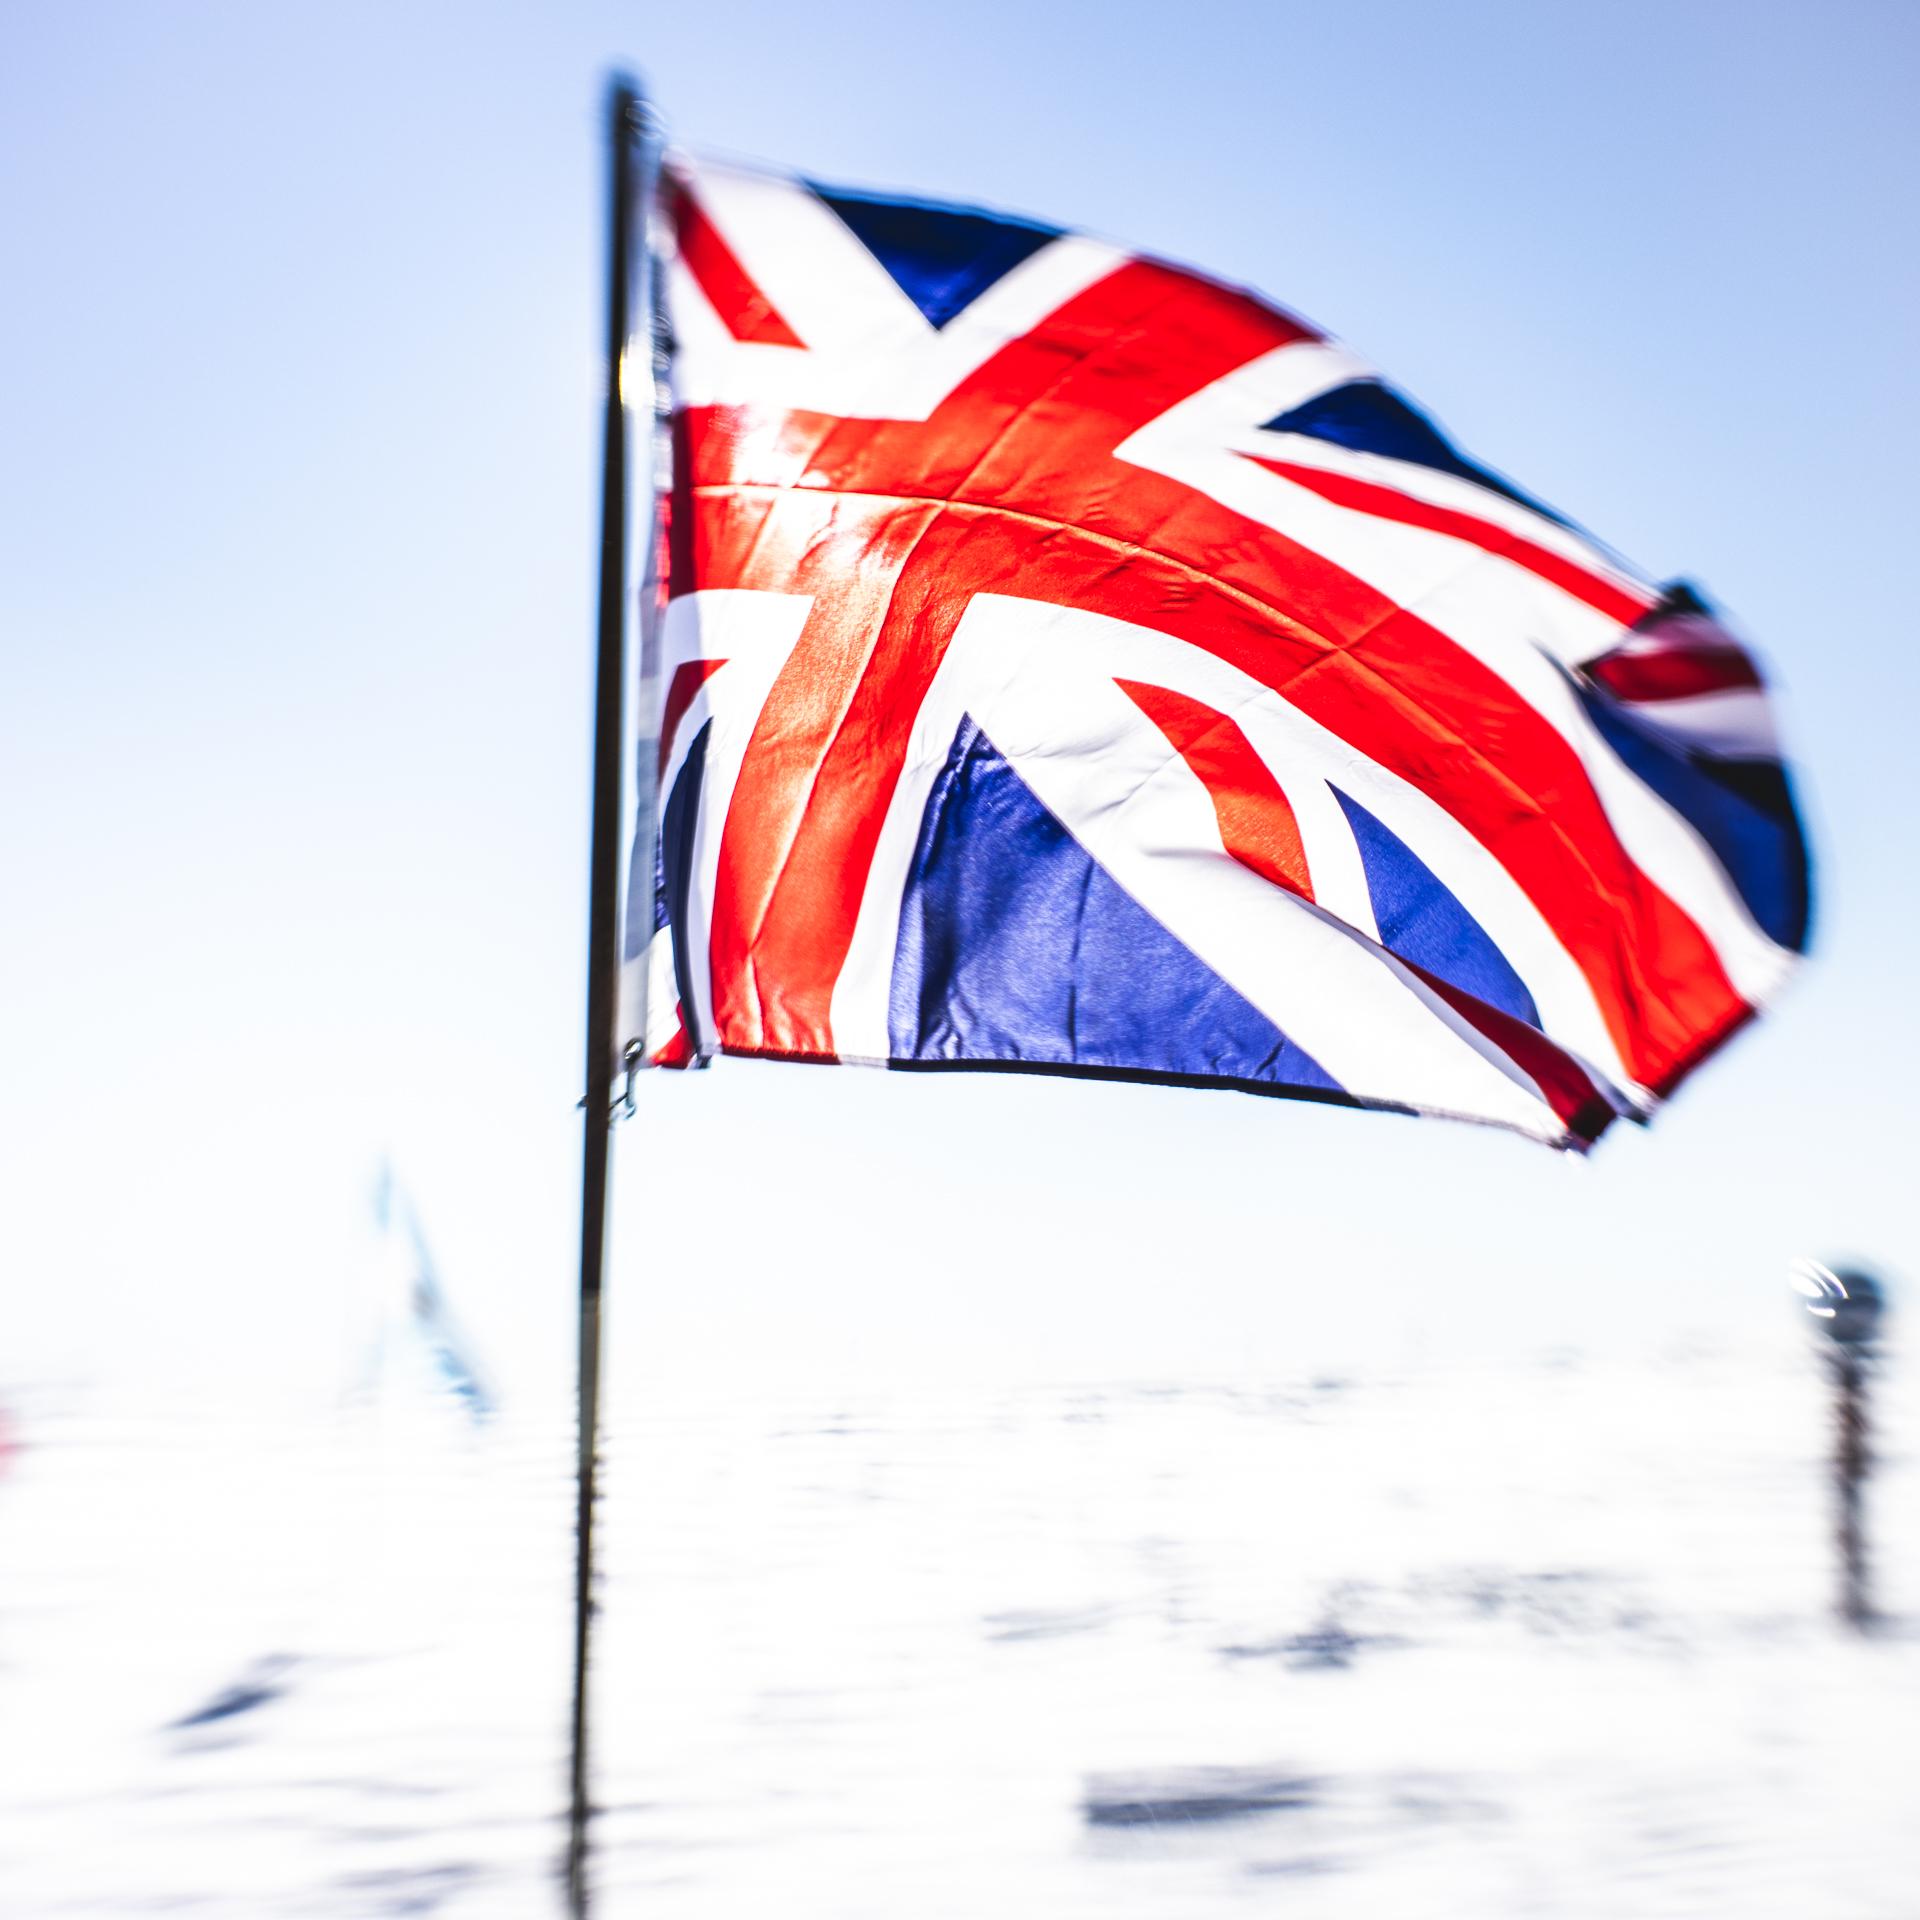 Antarctica Sol 45-9.jpg